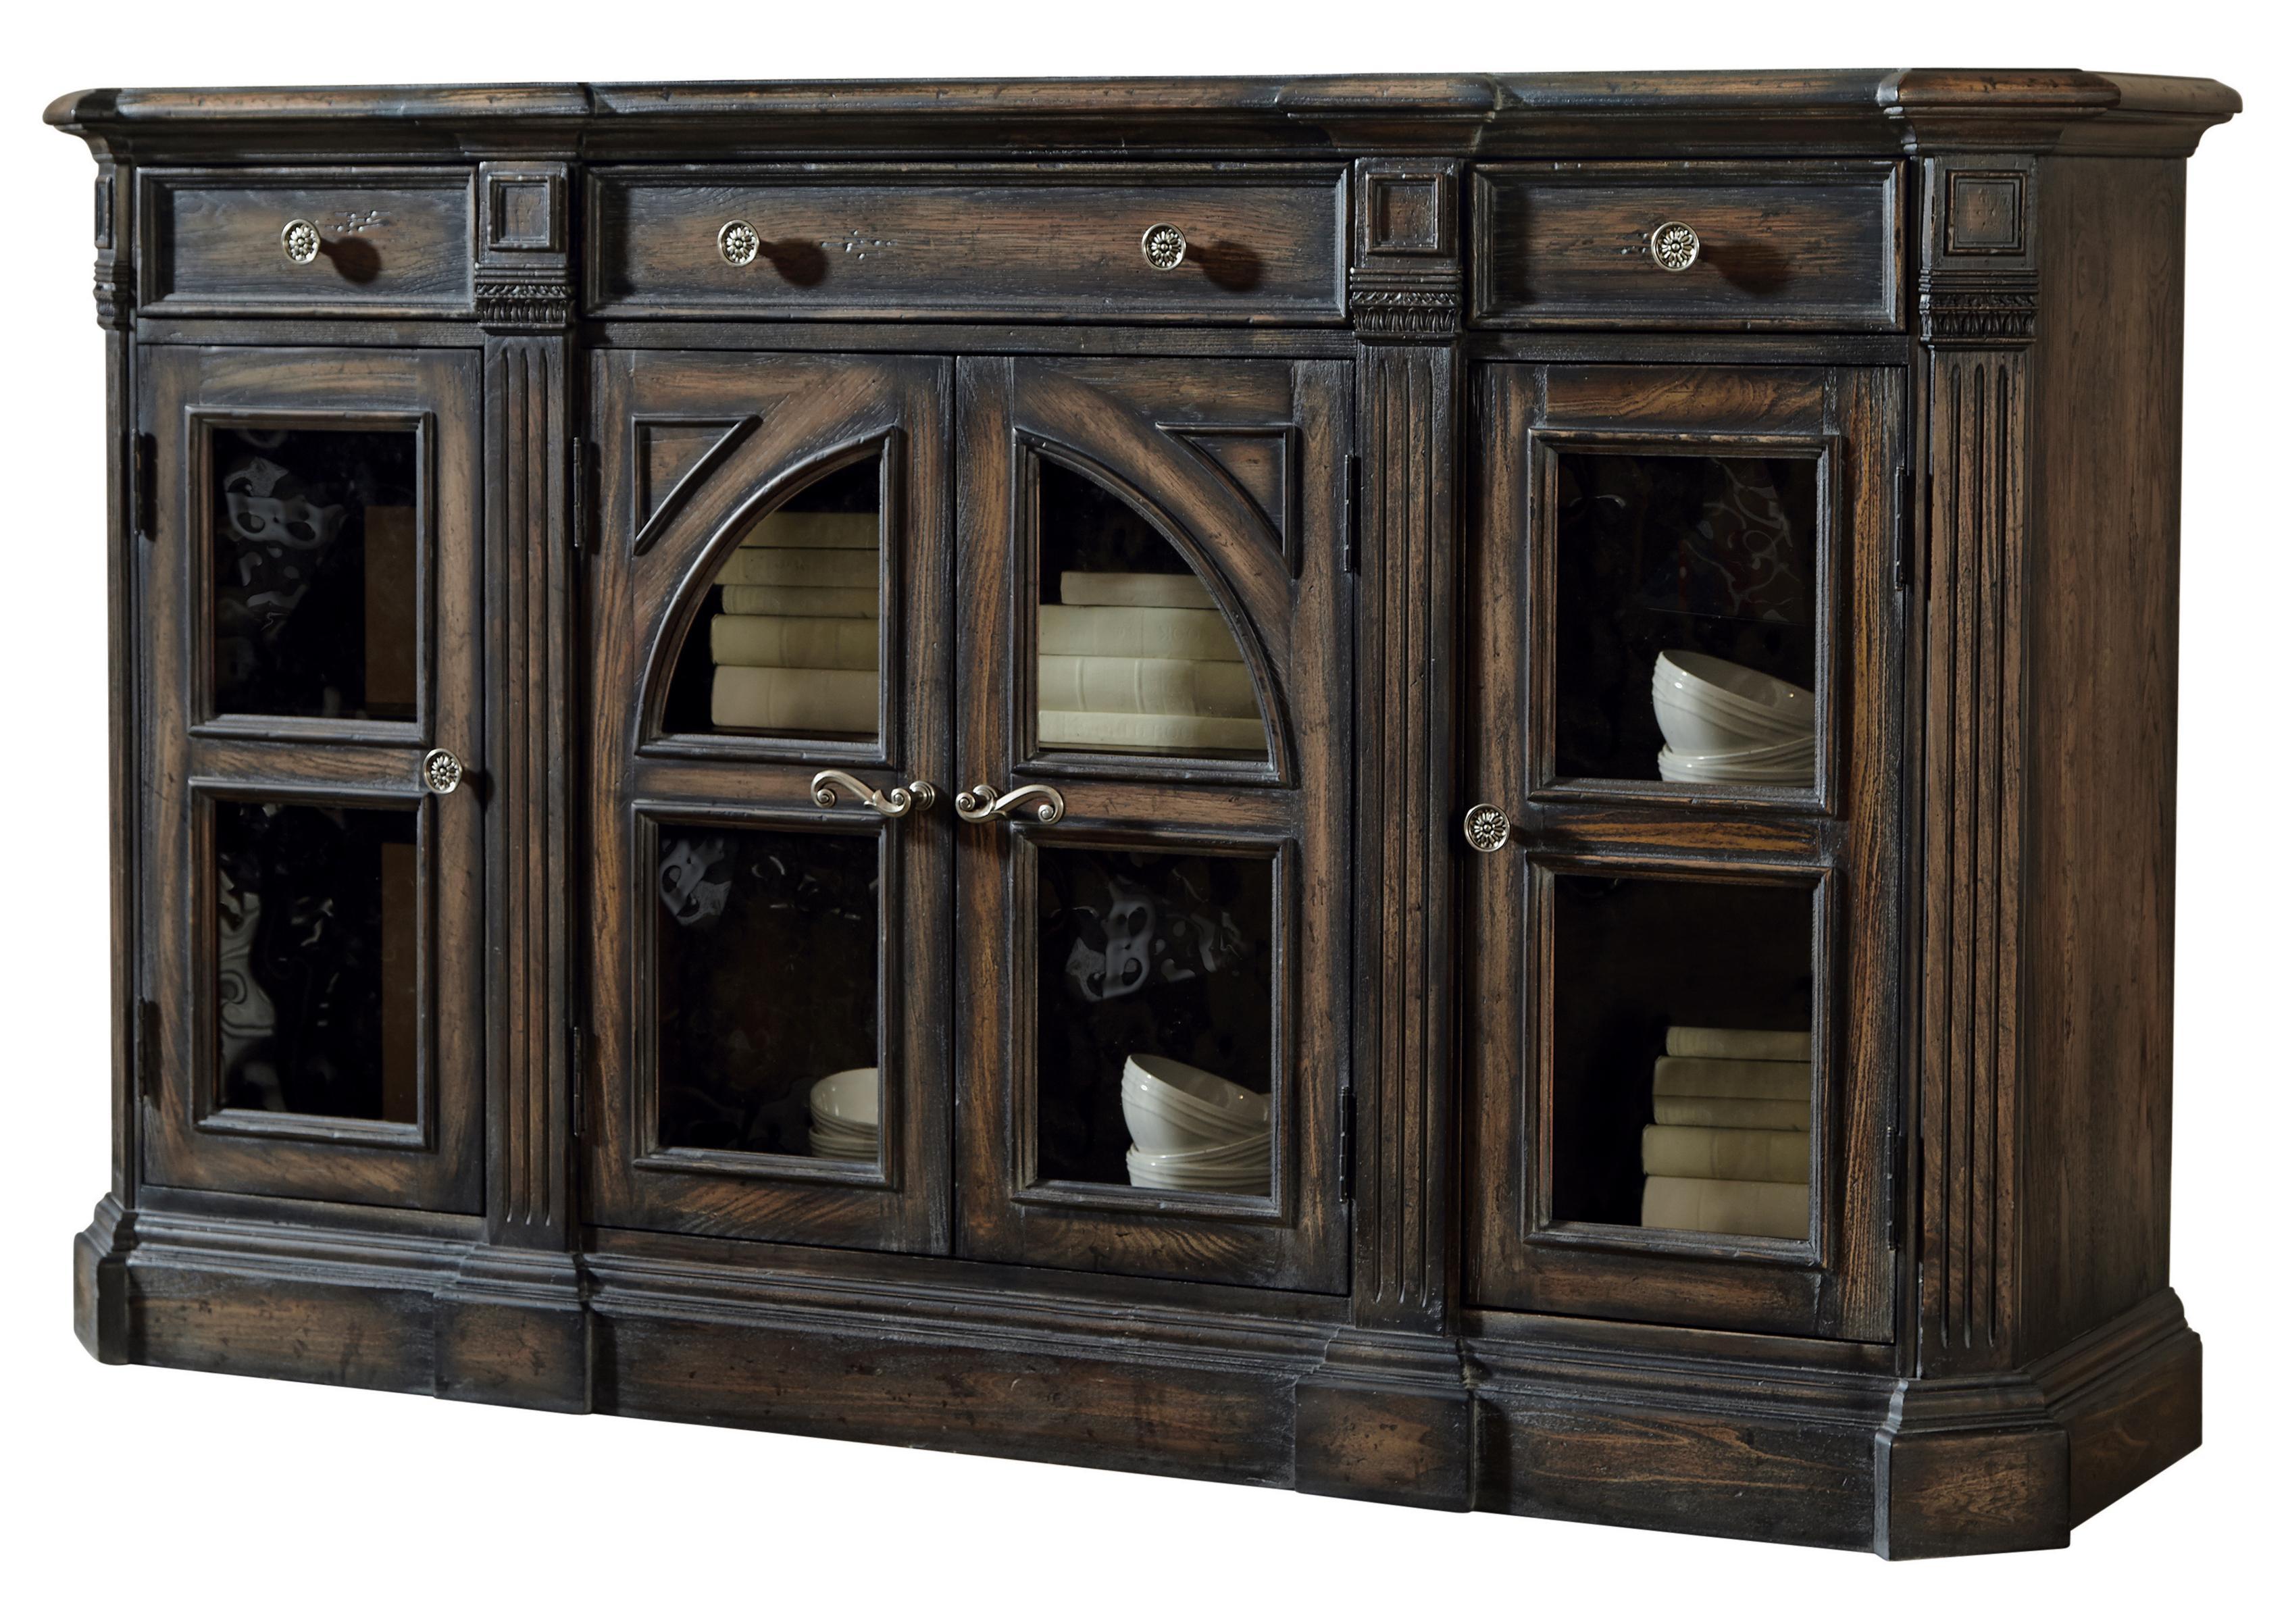 Pulaski Furniture Accentrics Home Delmar Sideboard - Item Number: 203009